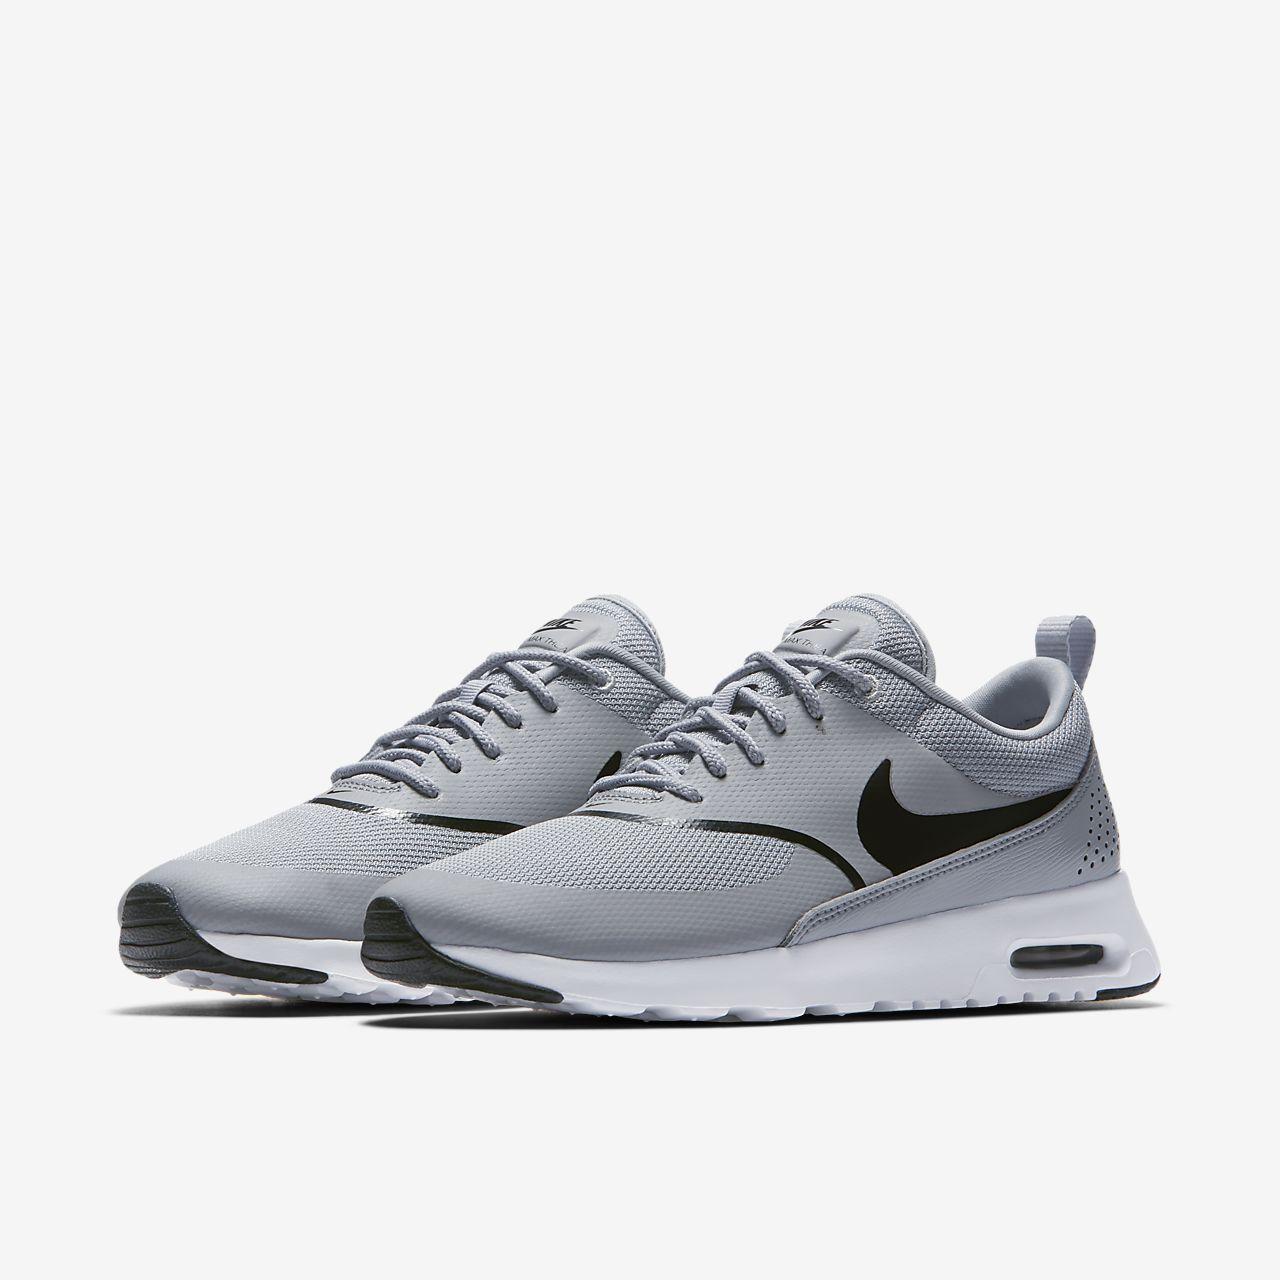 sports shoes 06f6c 2ec1c ... Chaussure Nike Air Max Thea pour Femme